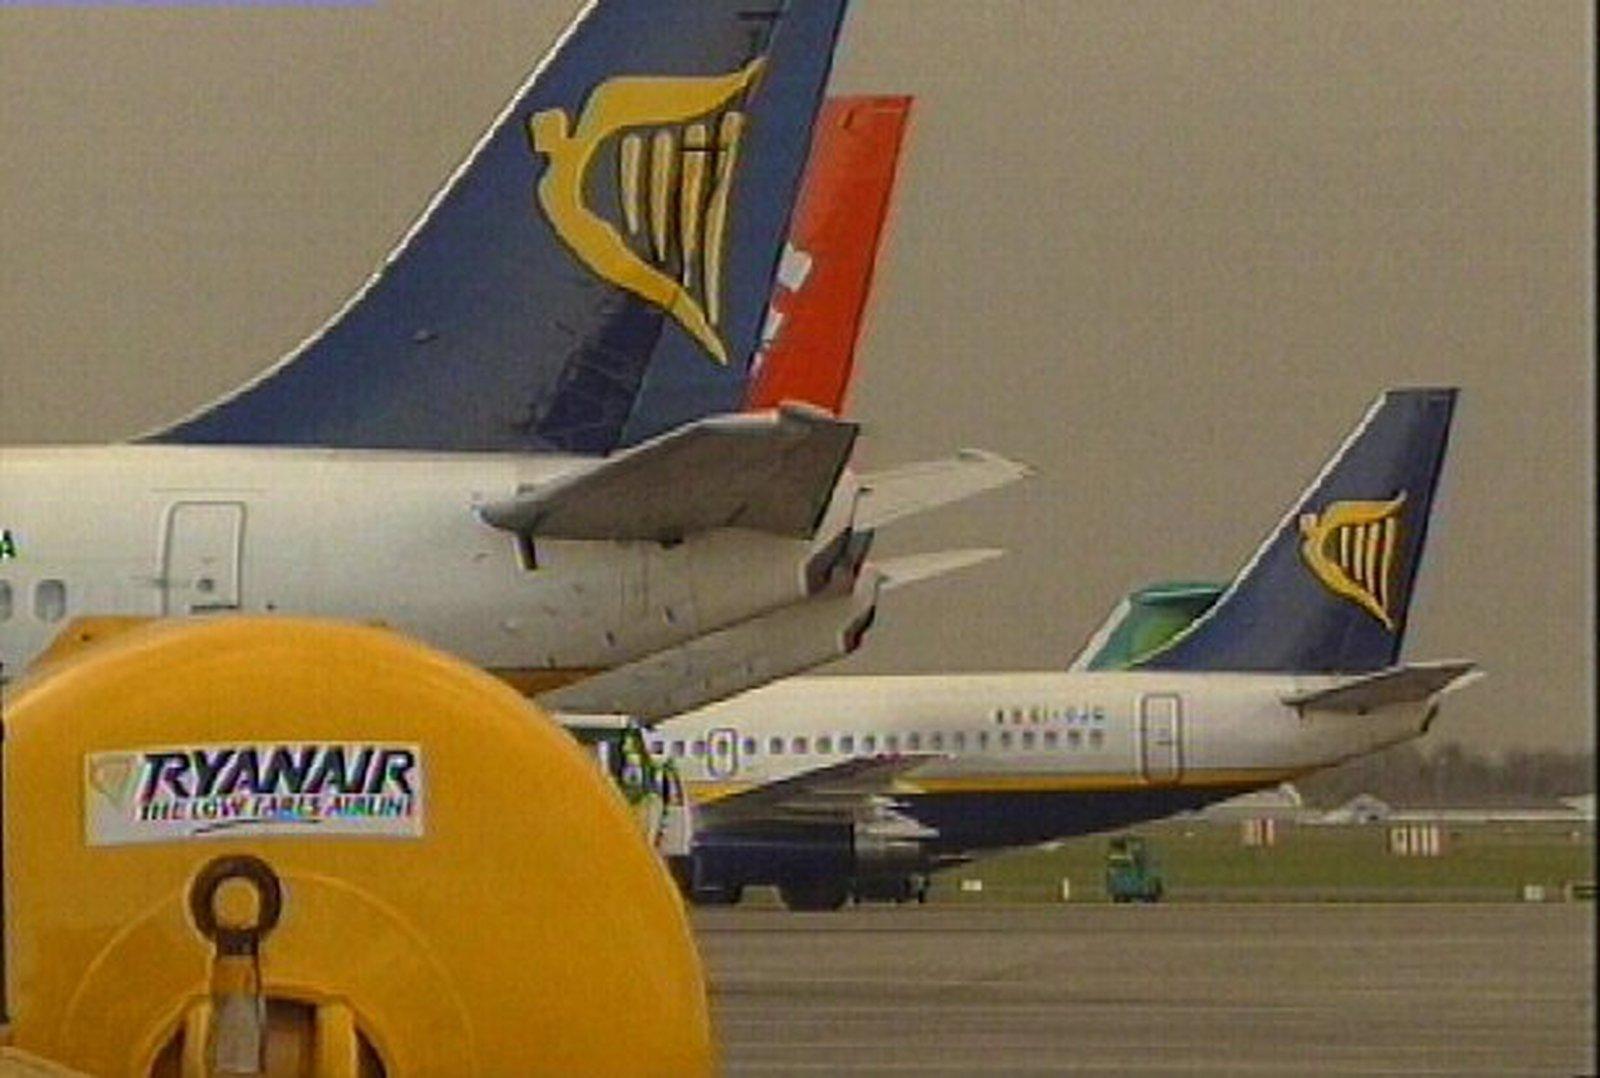 Ryanair Forum